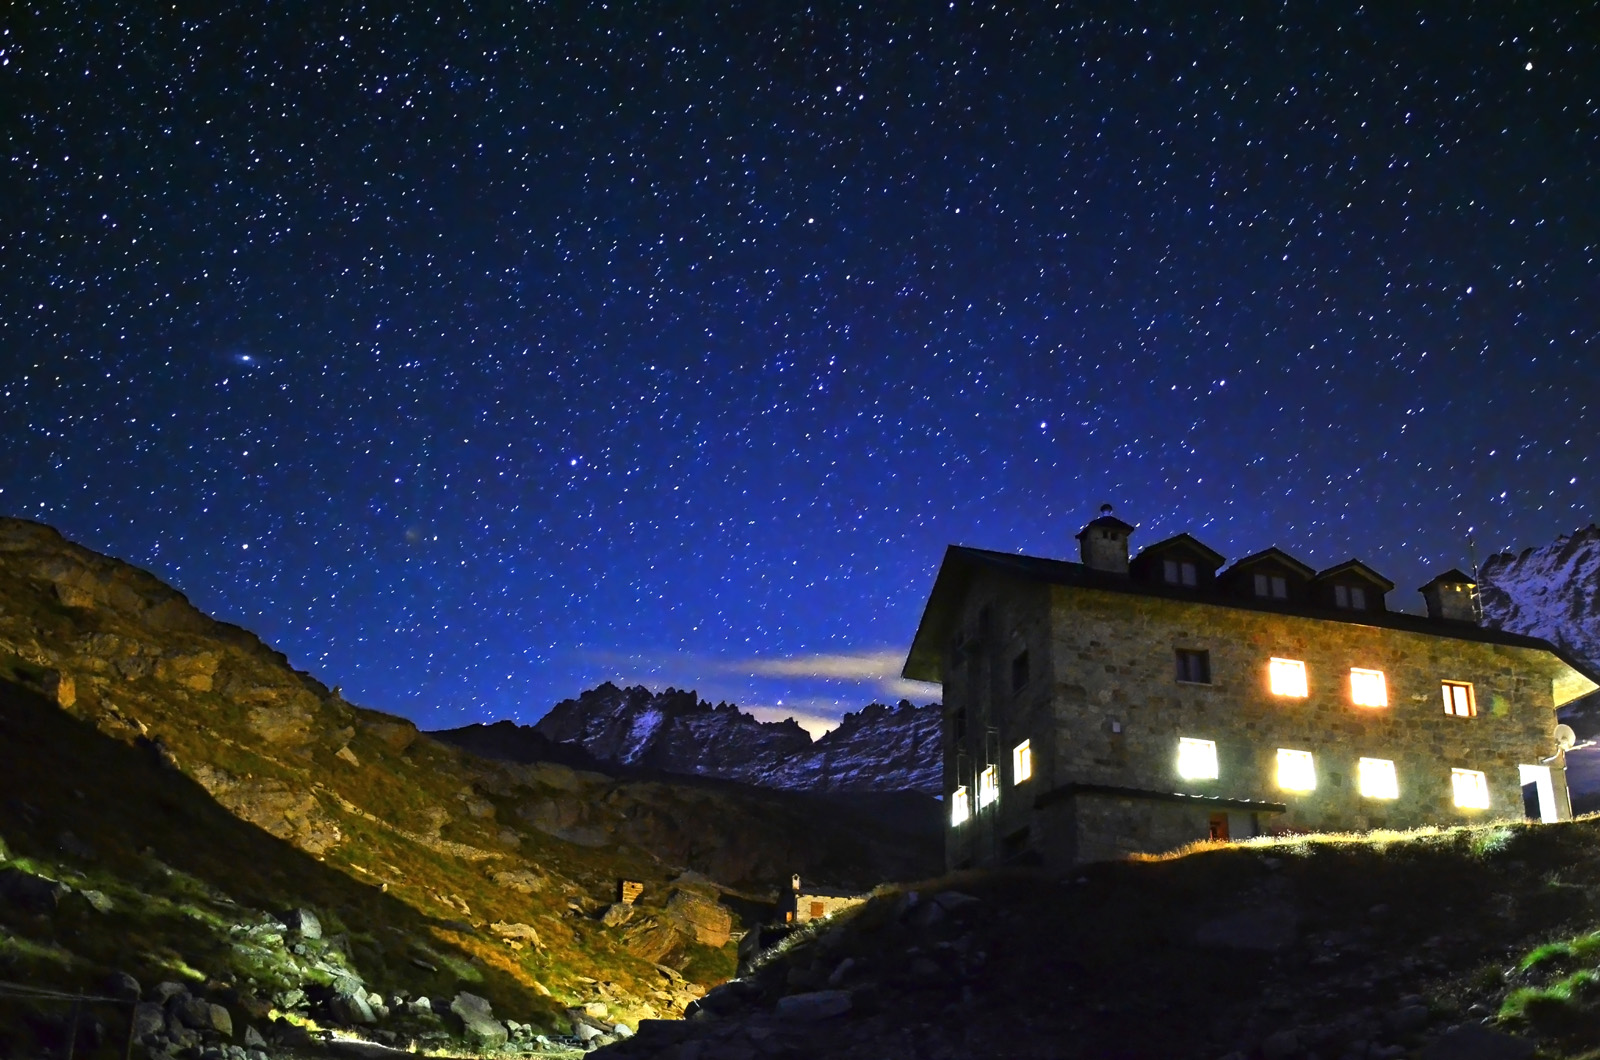 Shelter under the stars...